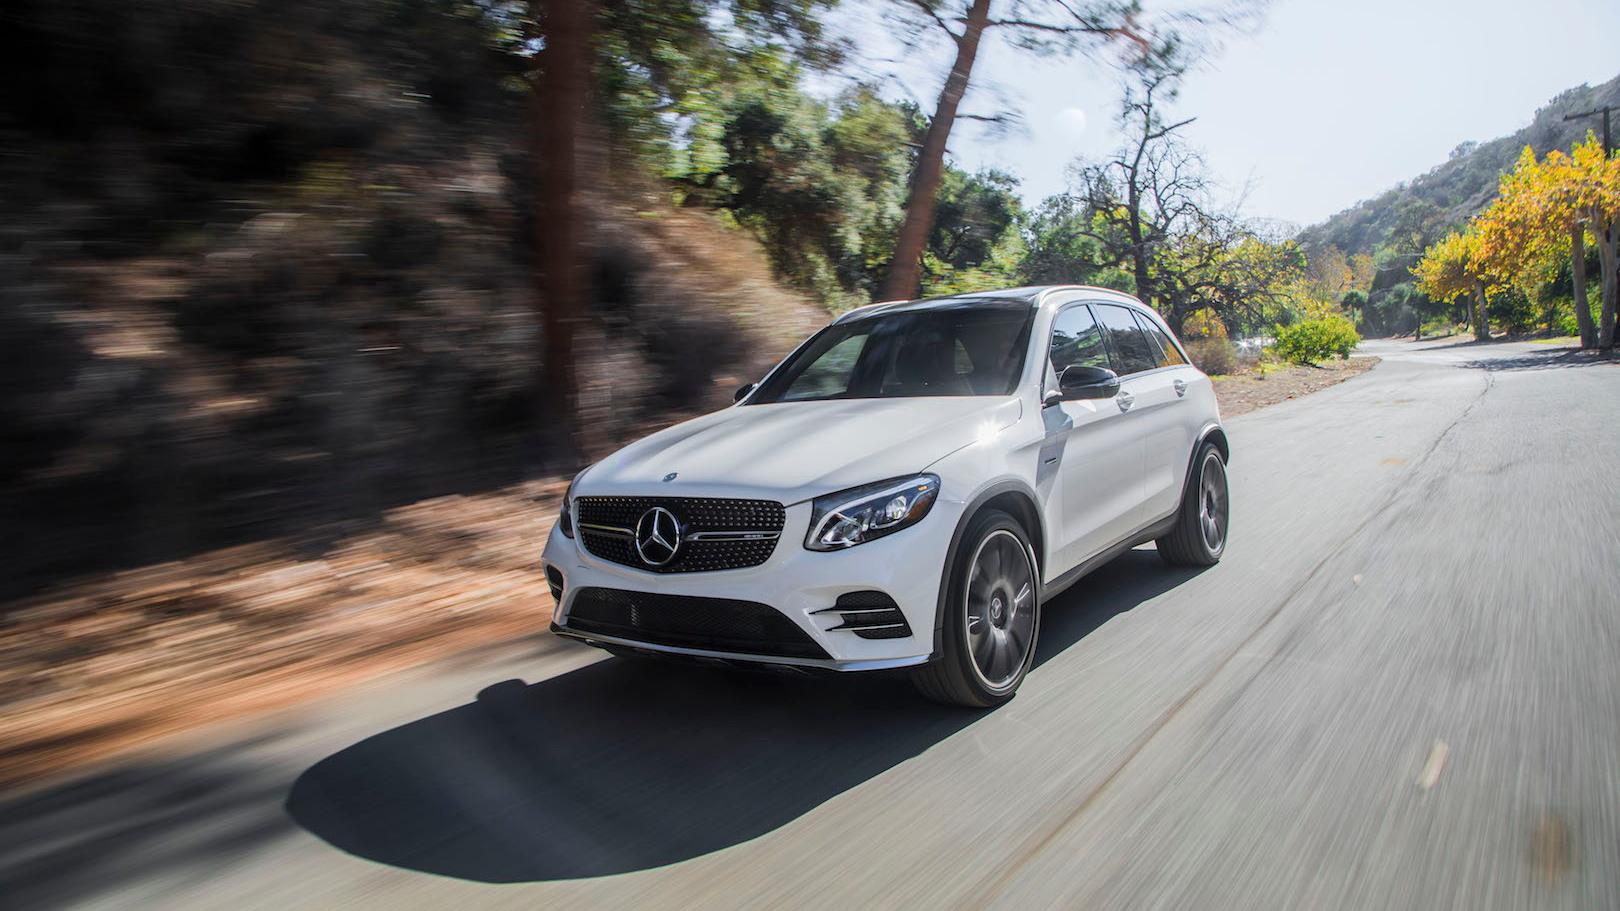 2019 Mercedes-Benz GLC-Class (Mercedes-AMG GLC43)